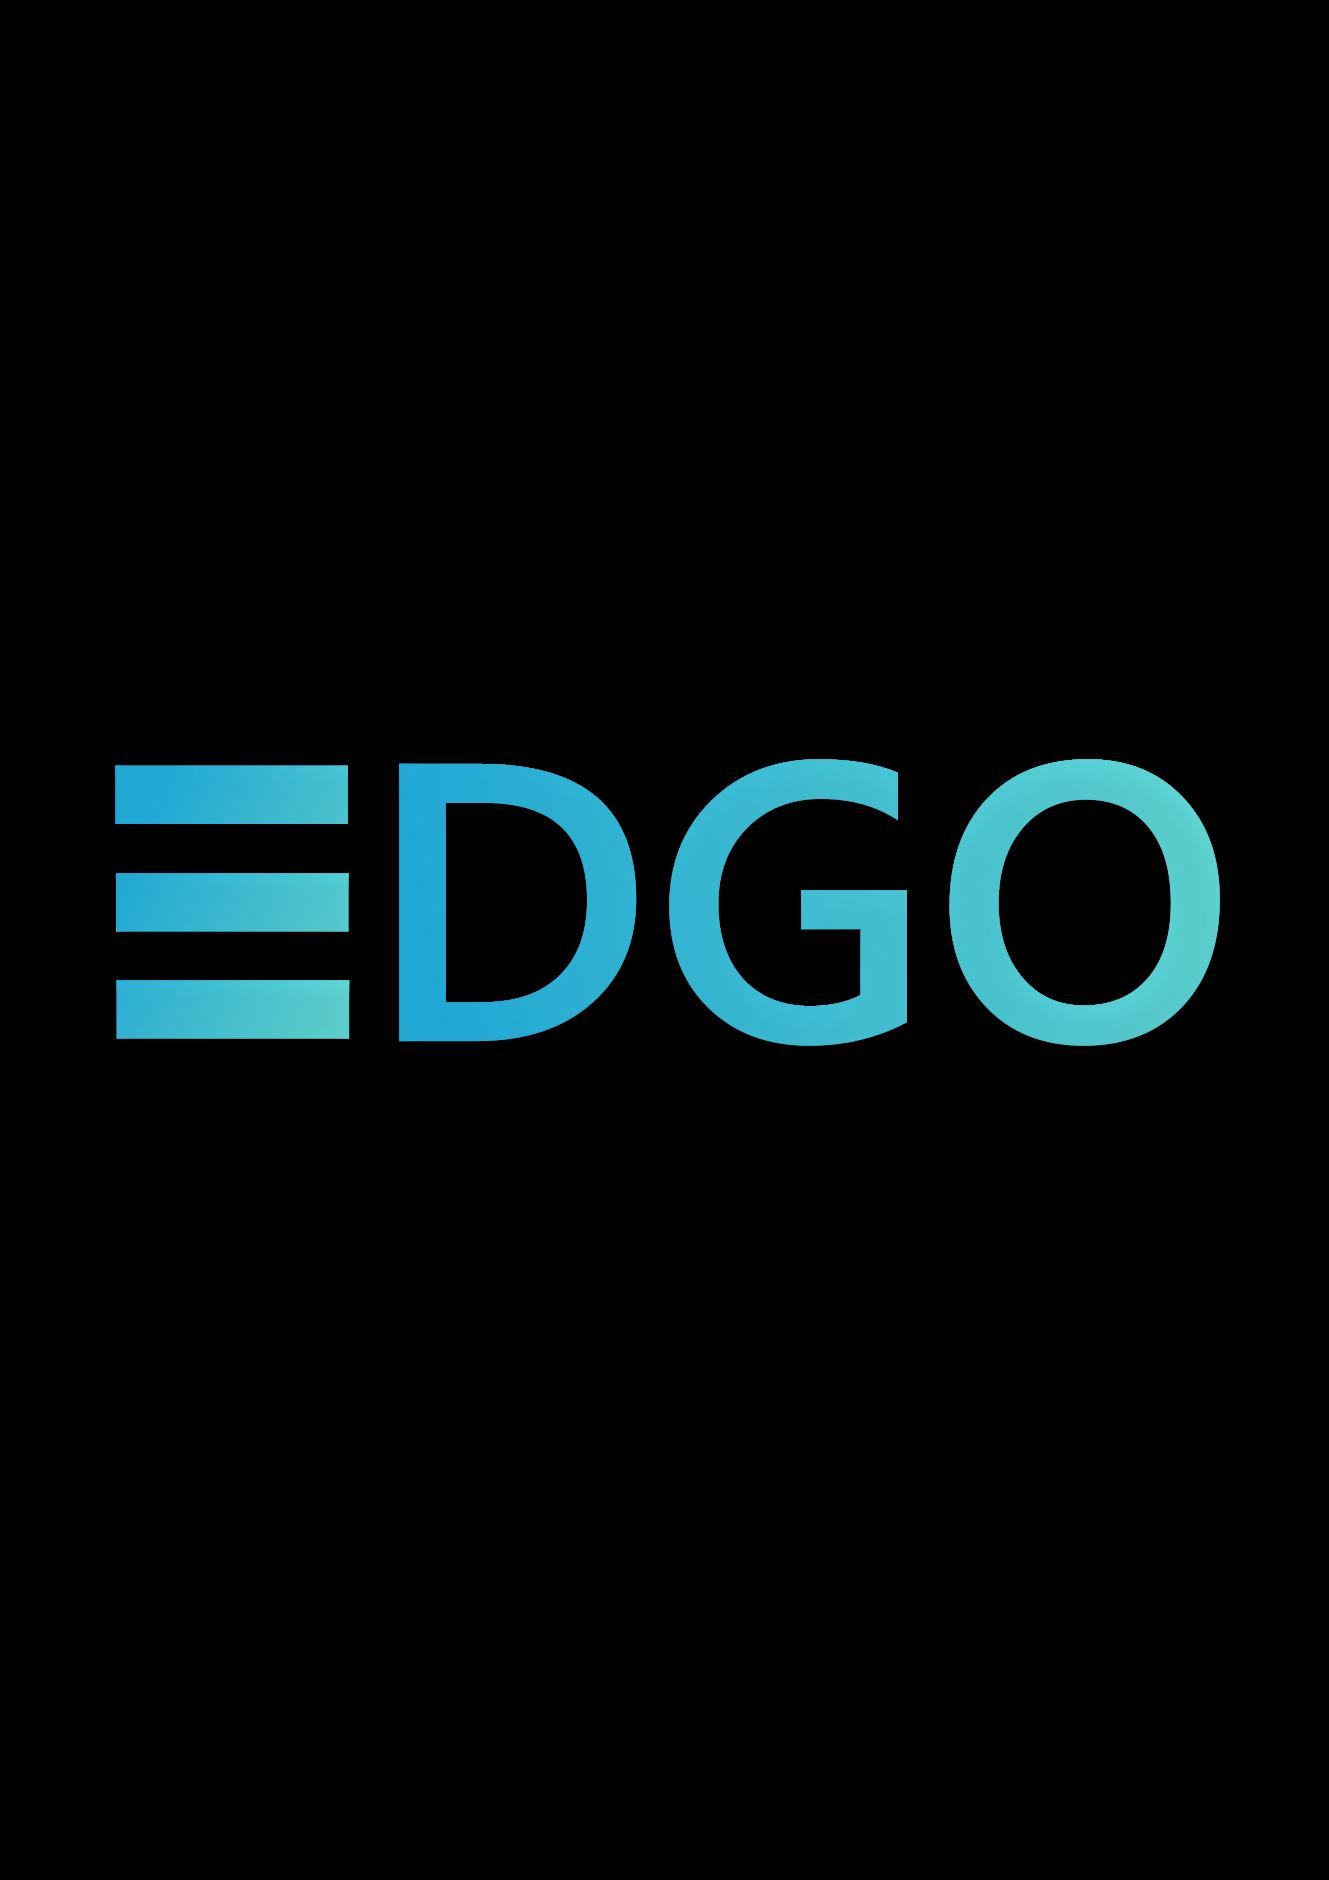 Edgo Solutions LLP